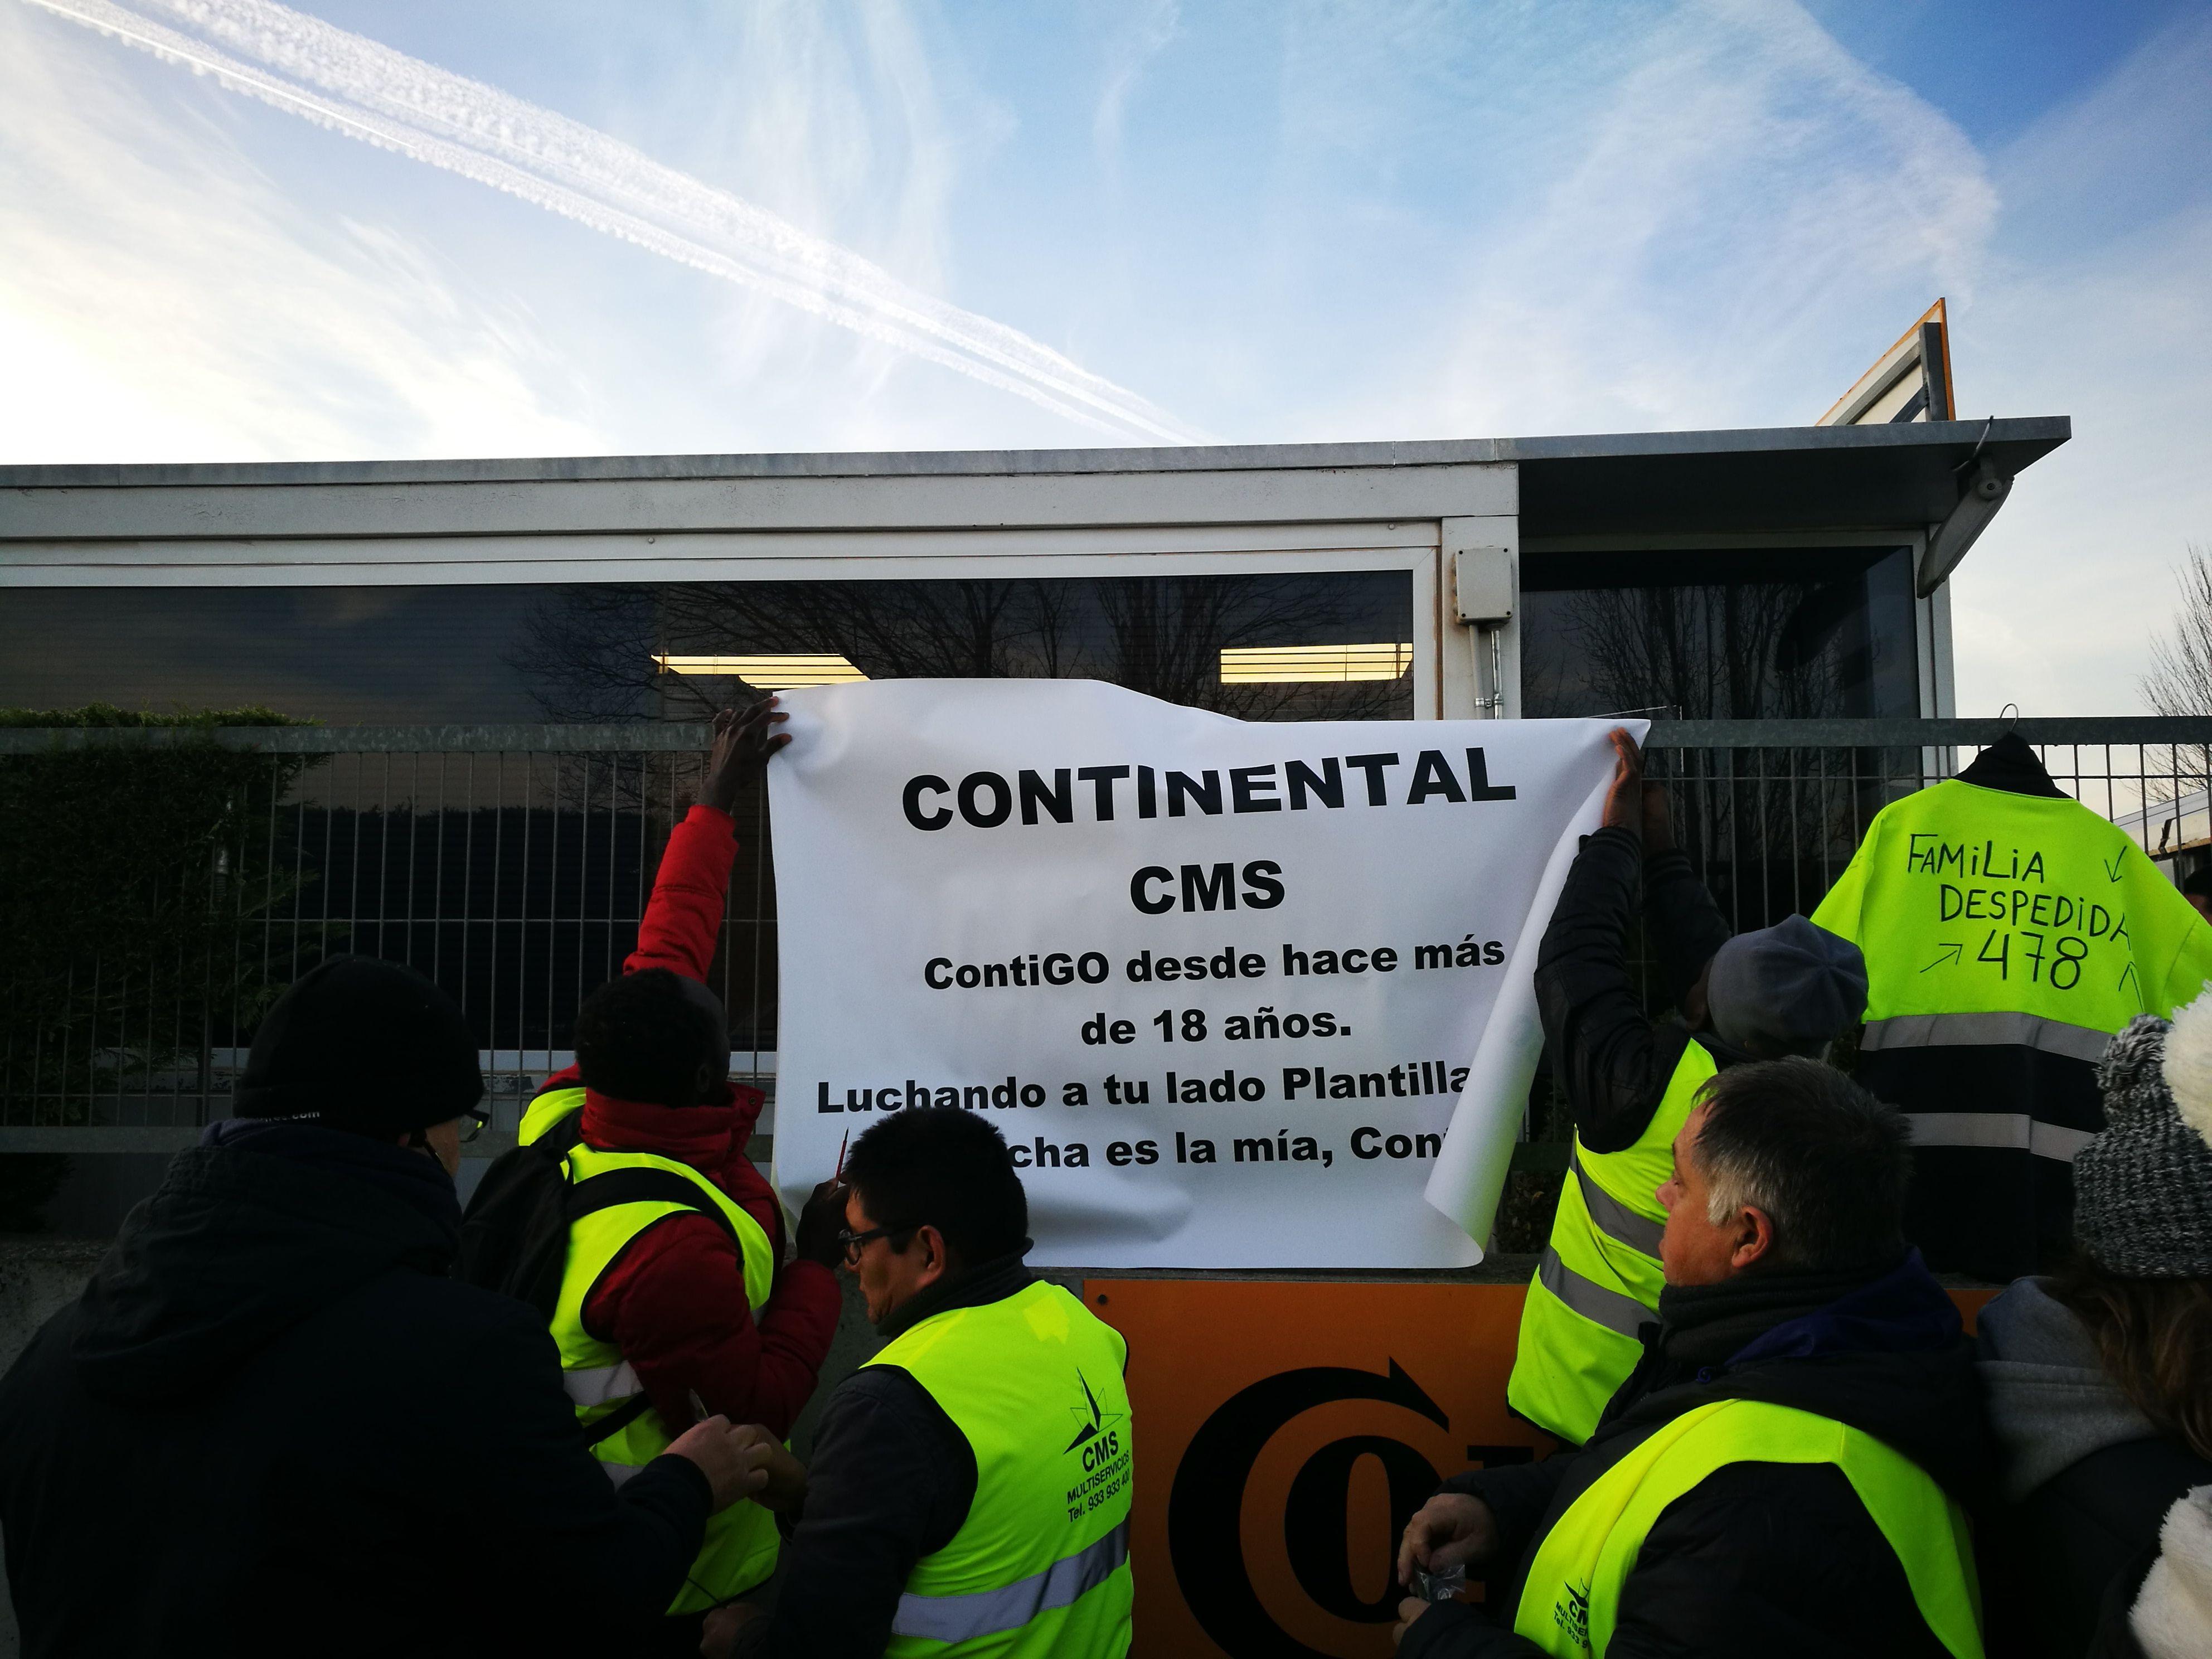 Vaga de la de plantilla Continental  15/01/2019